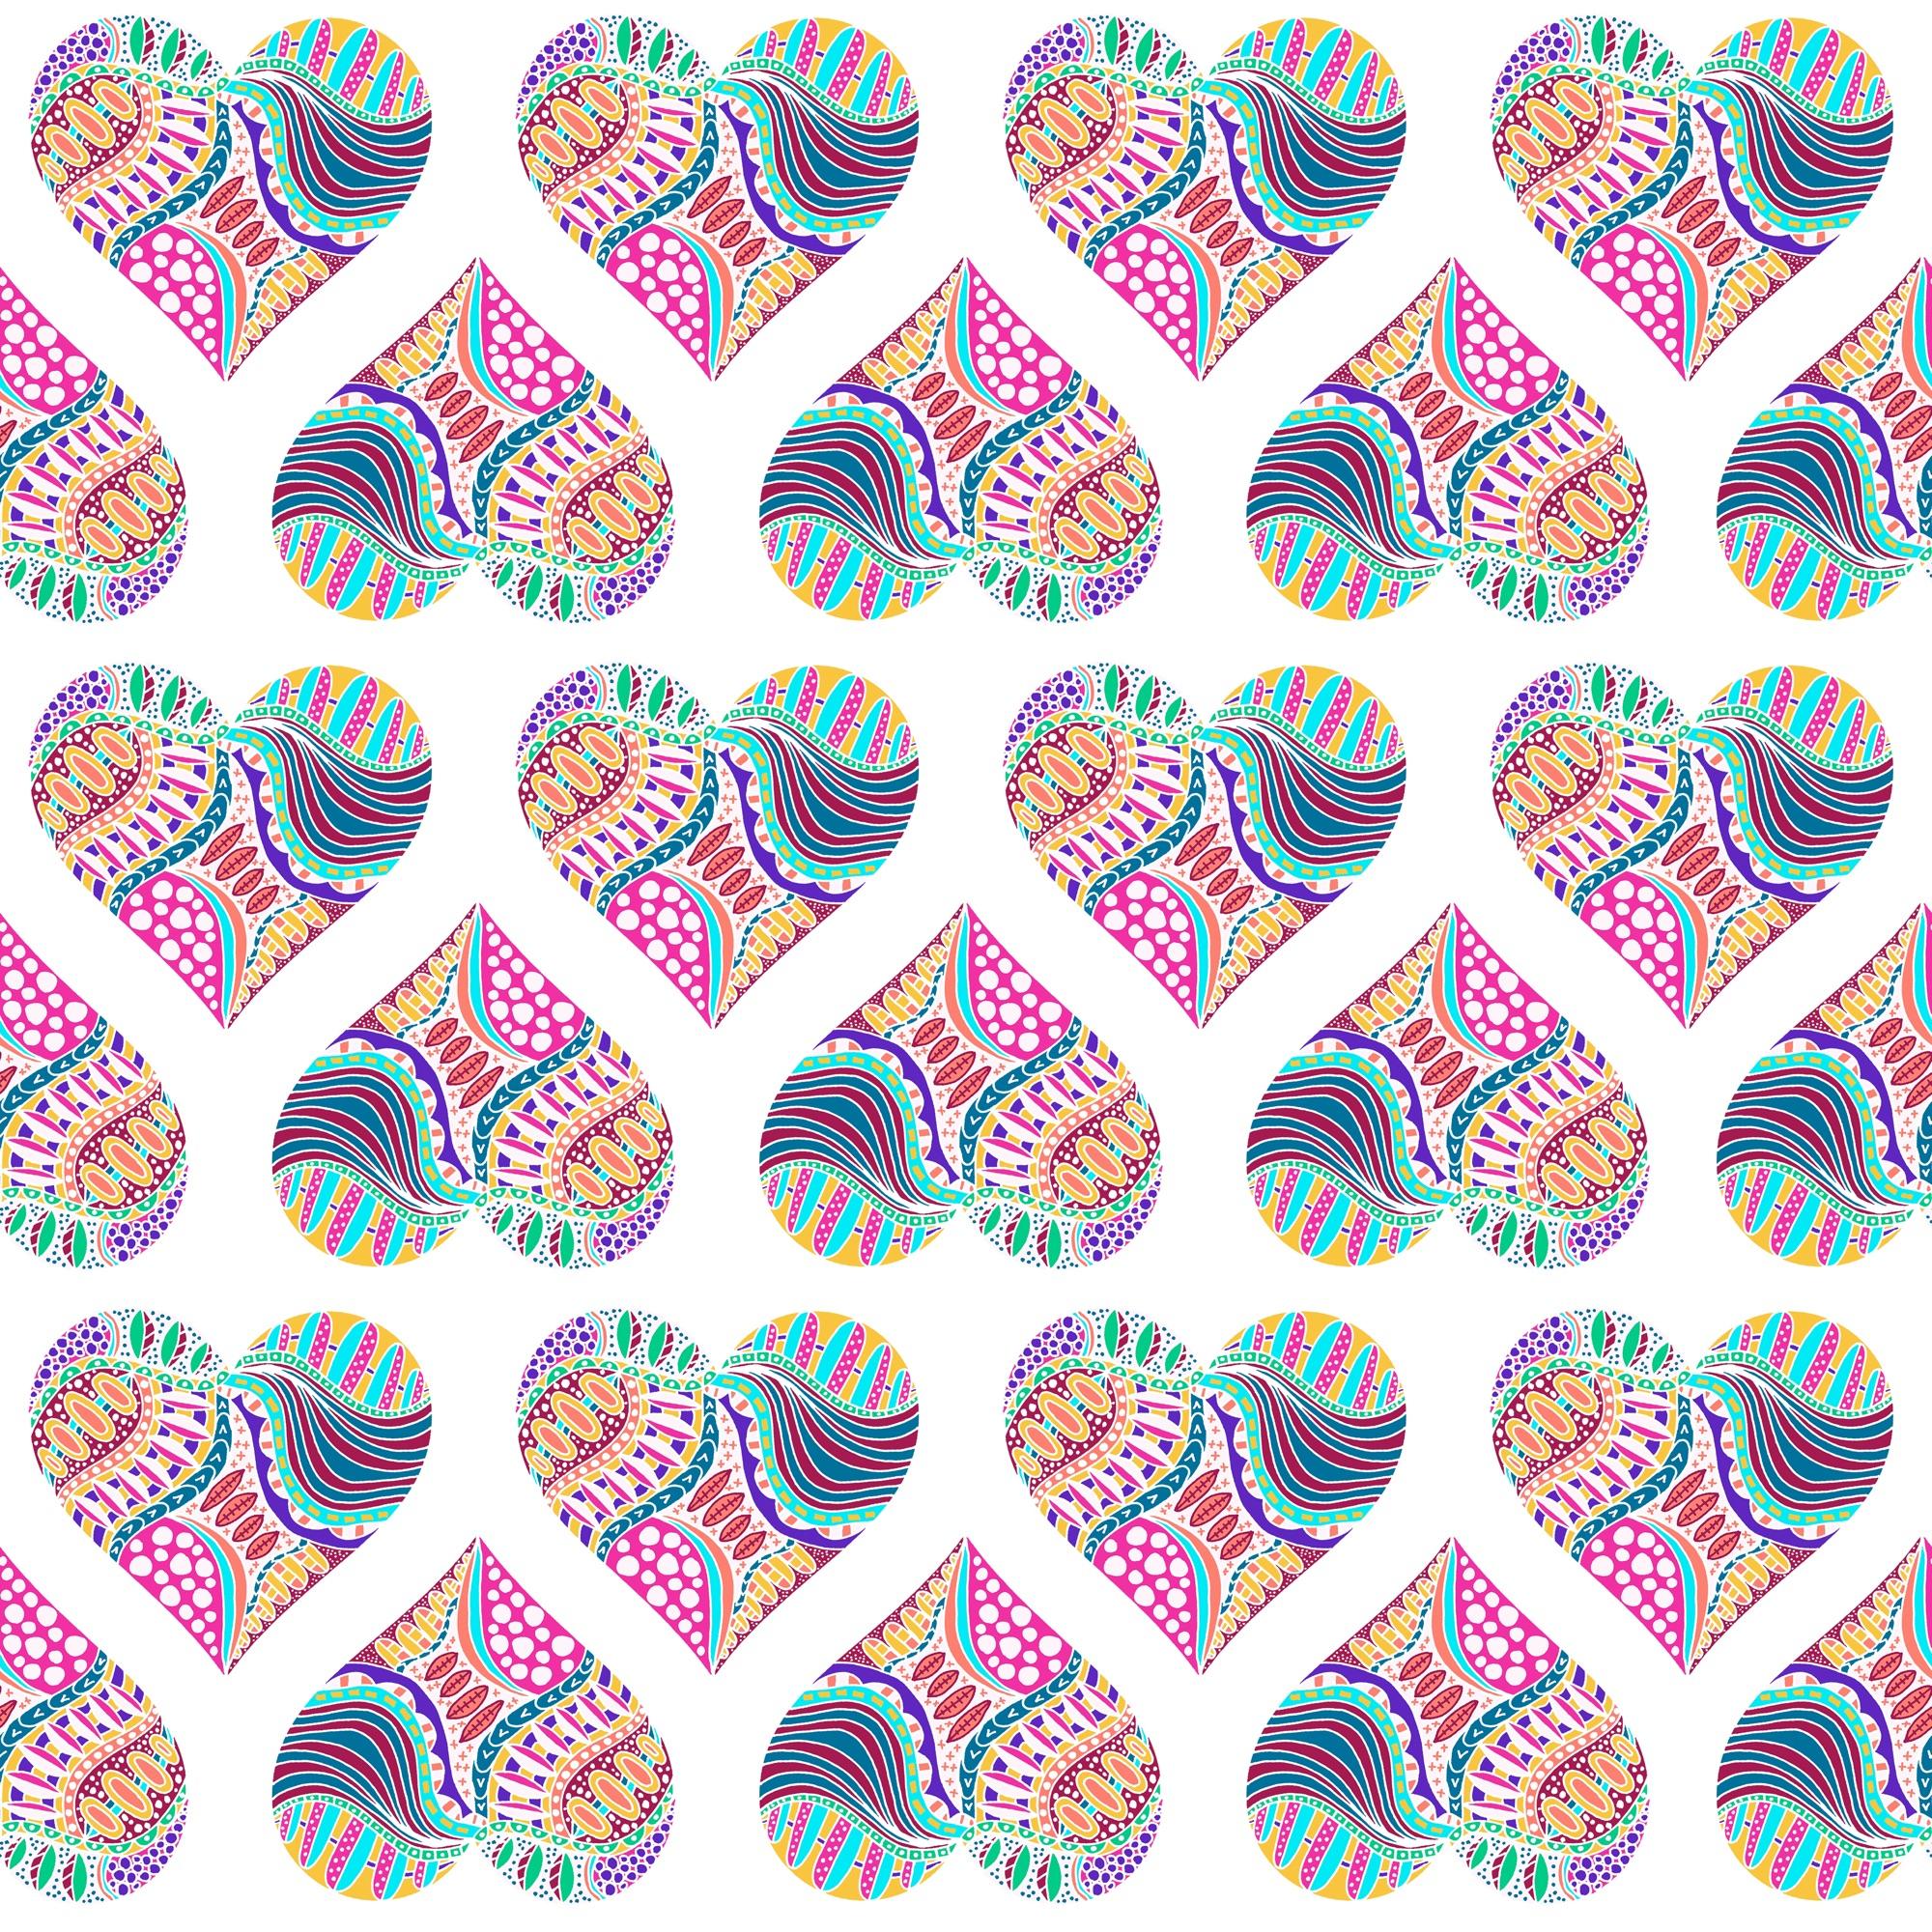 Halcyon Hearts design